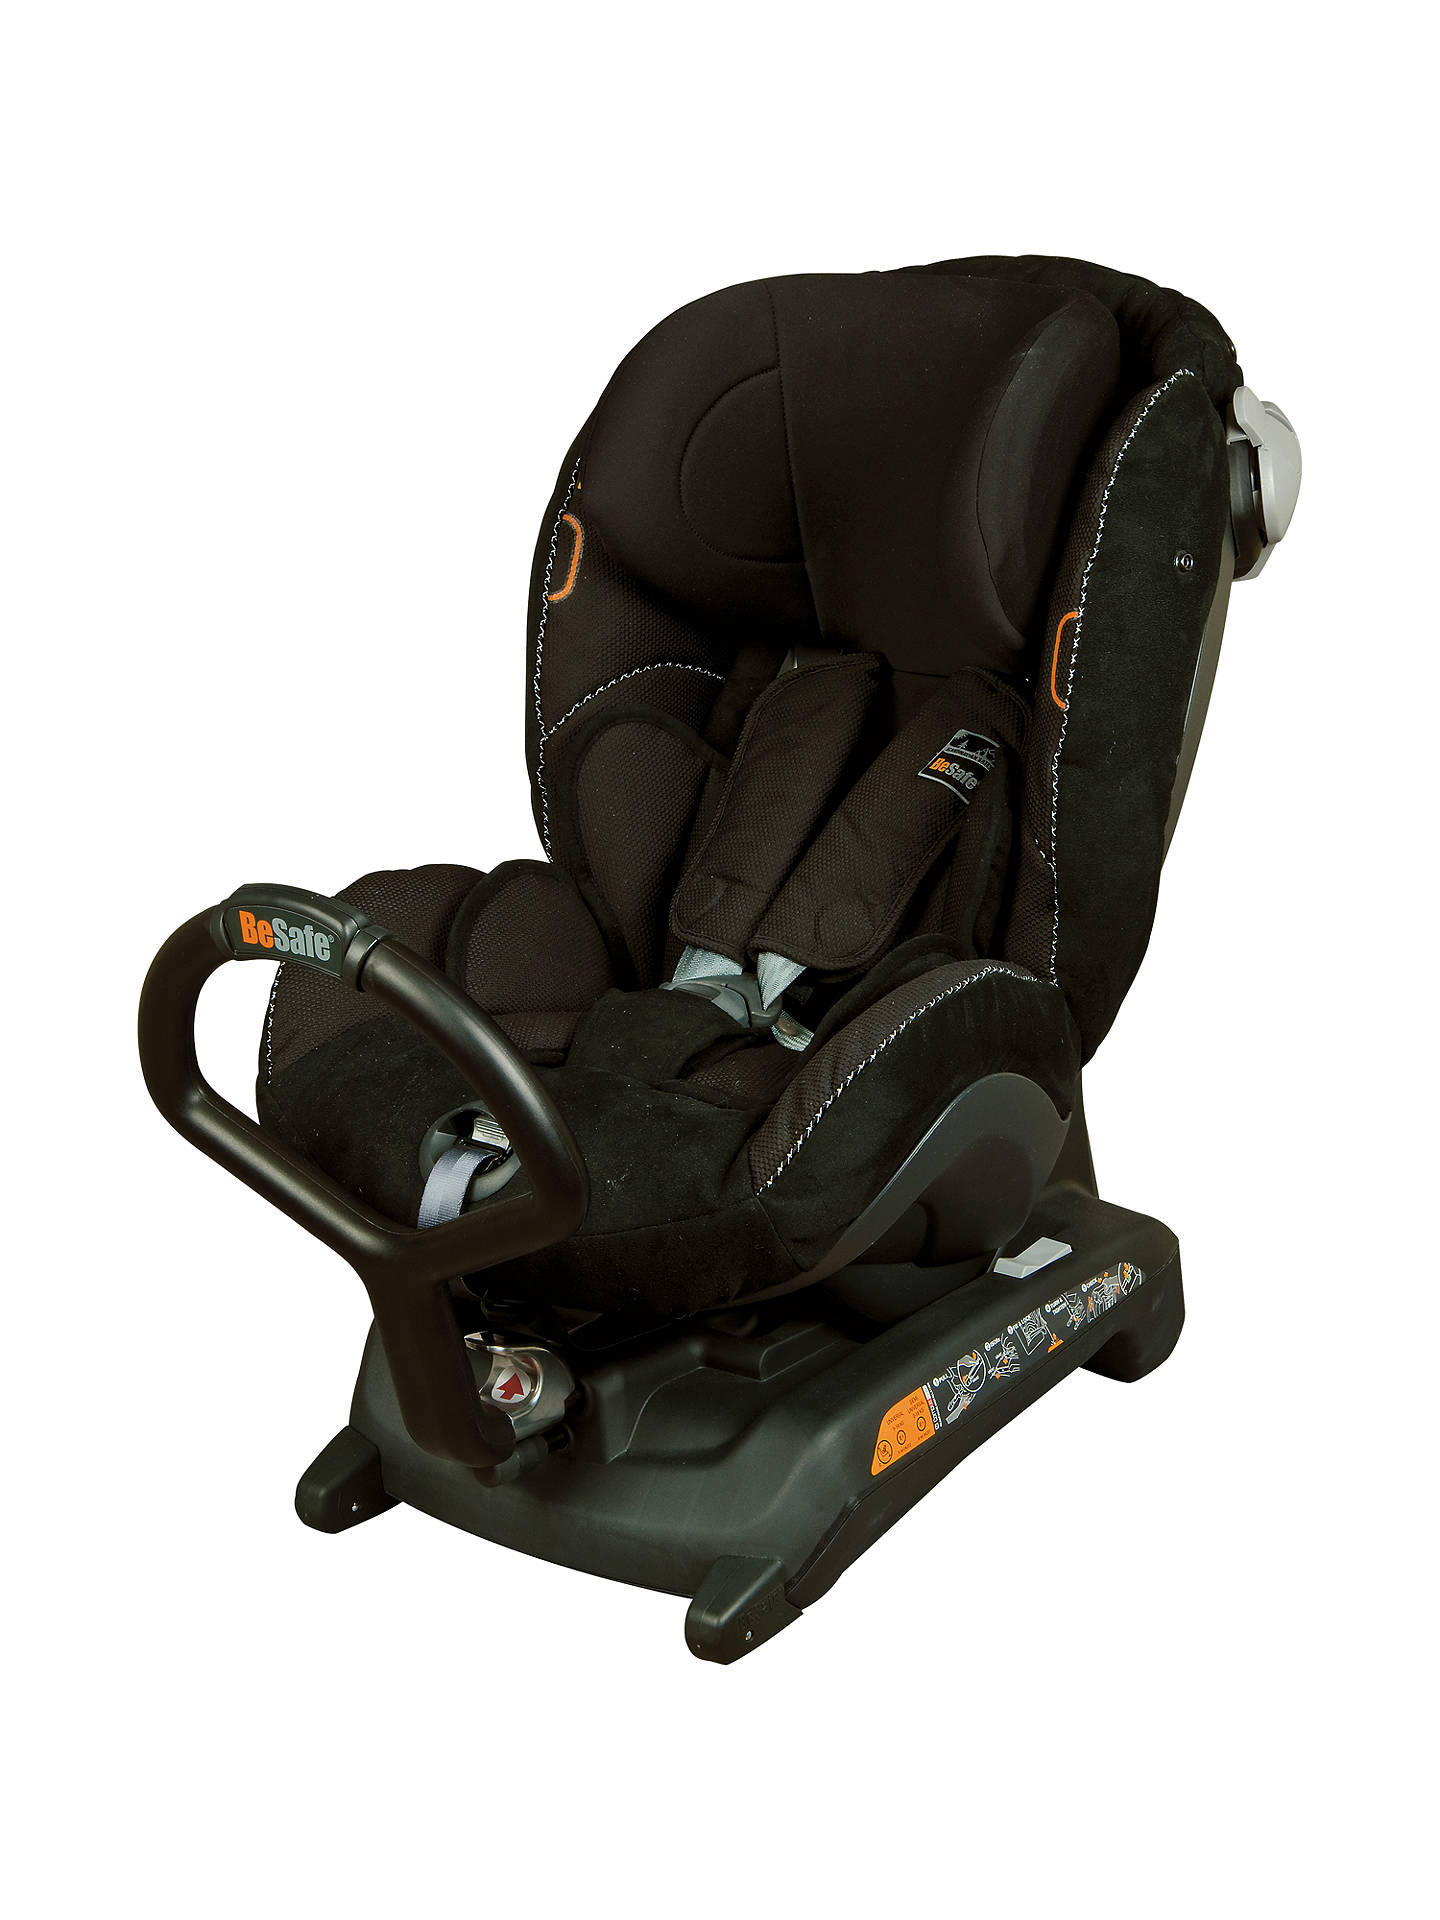 Besafe Izi Combi X3 Isofix Car Seat Black Alcantara Online At Johnlewis